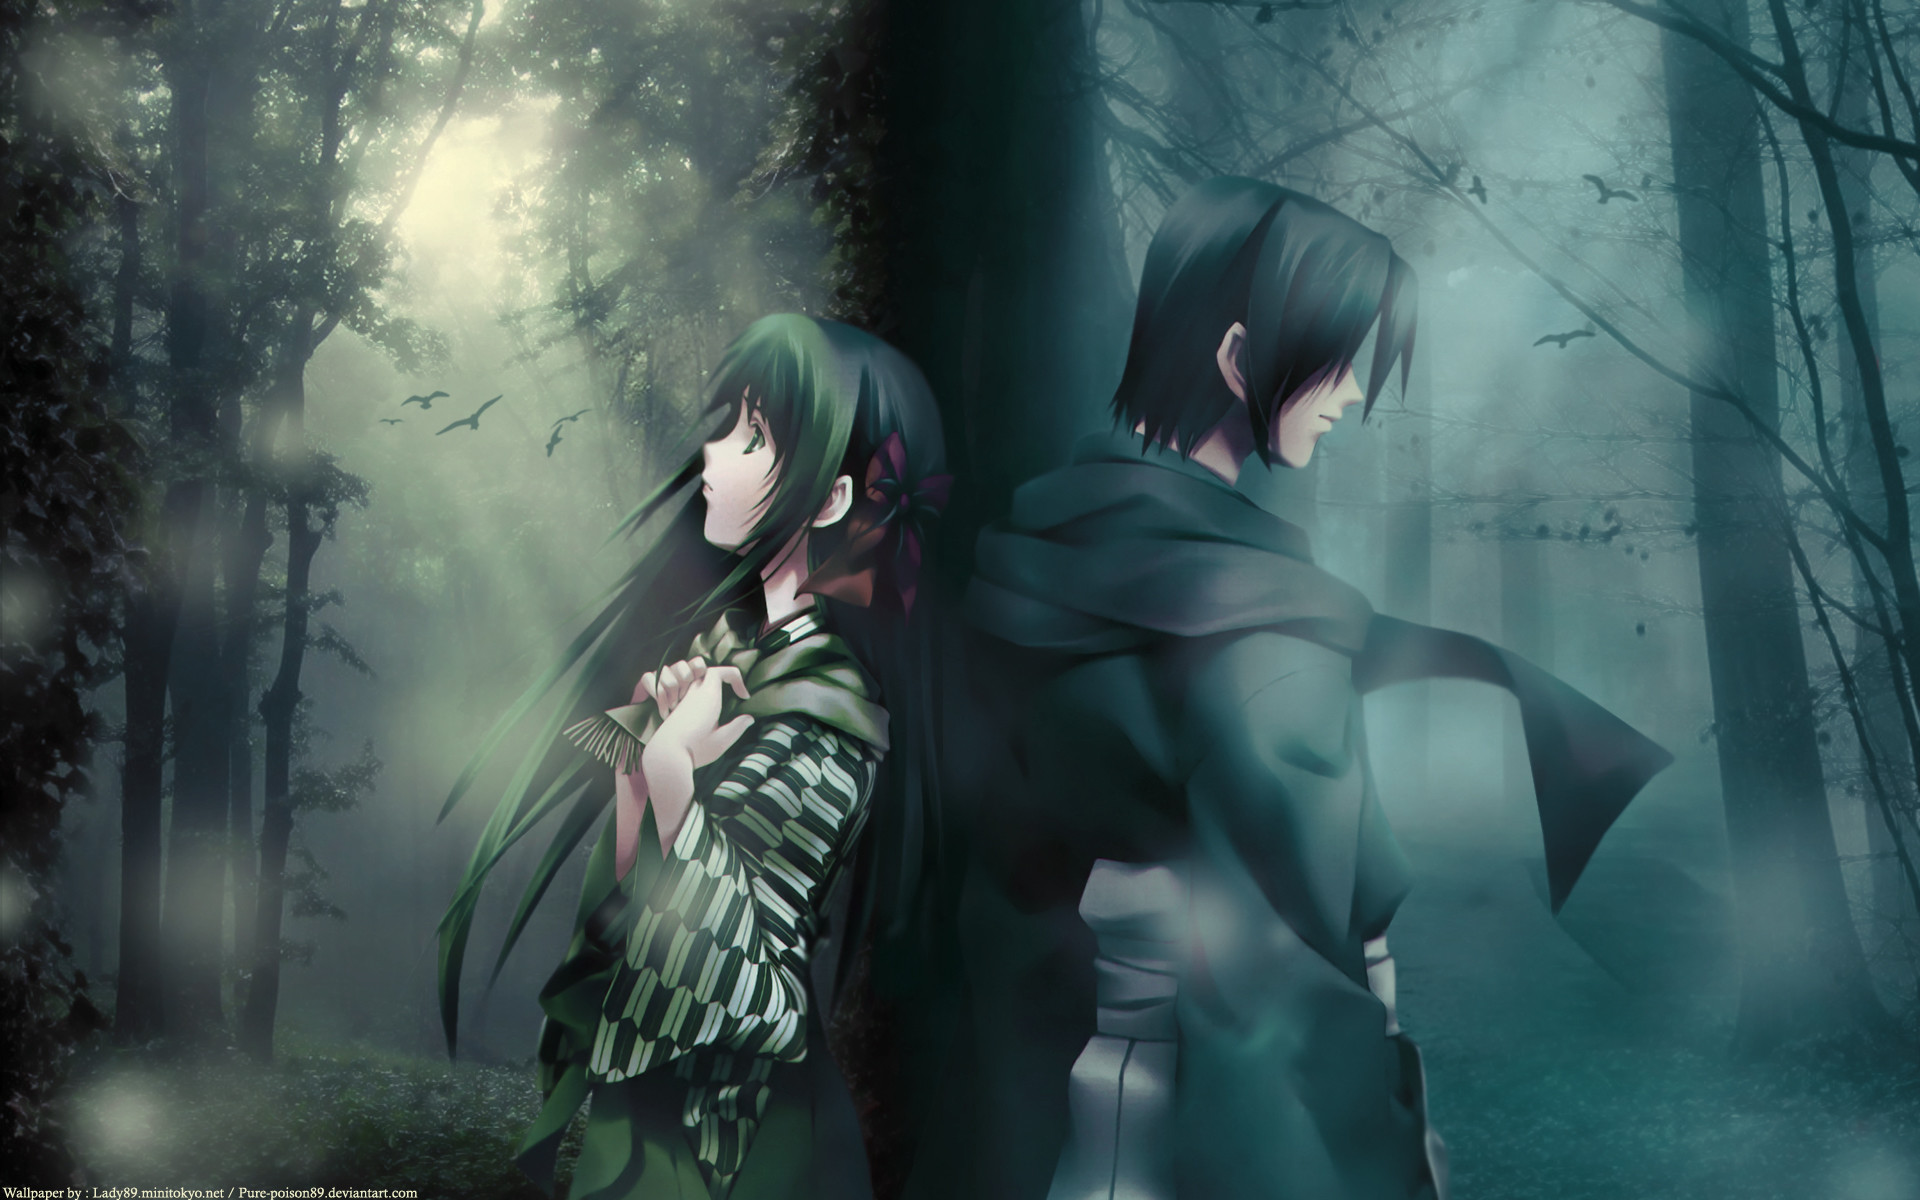 Sad anime wallpapers 78 images - Dark anime couples ...